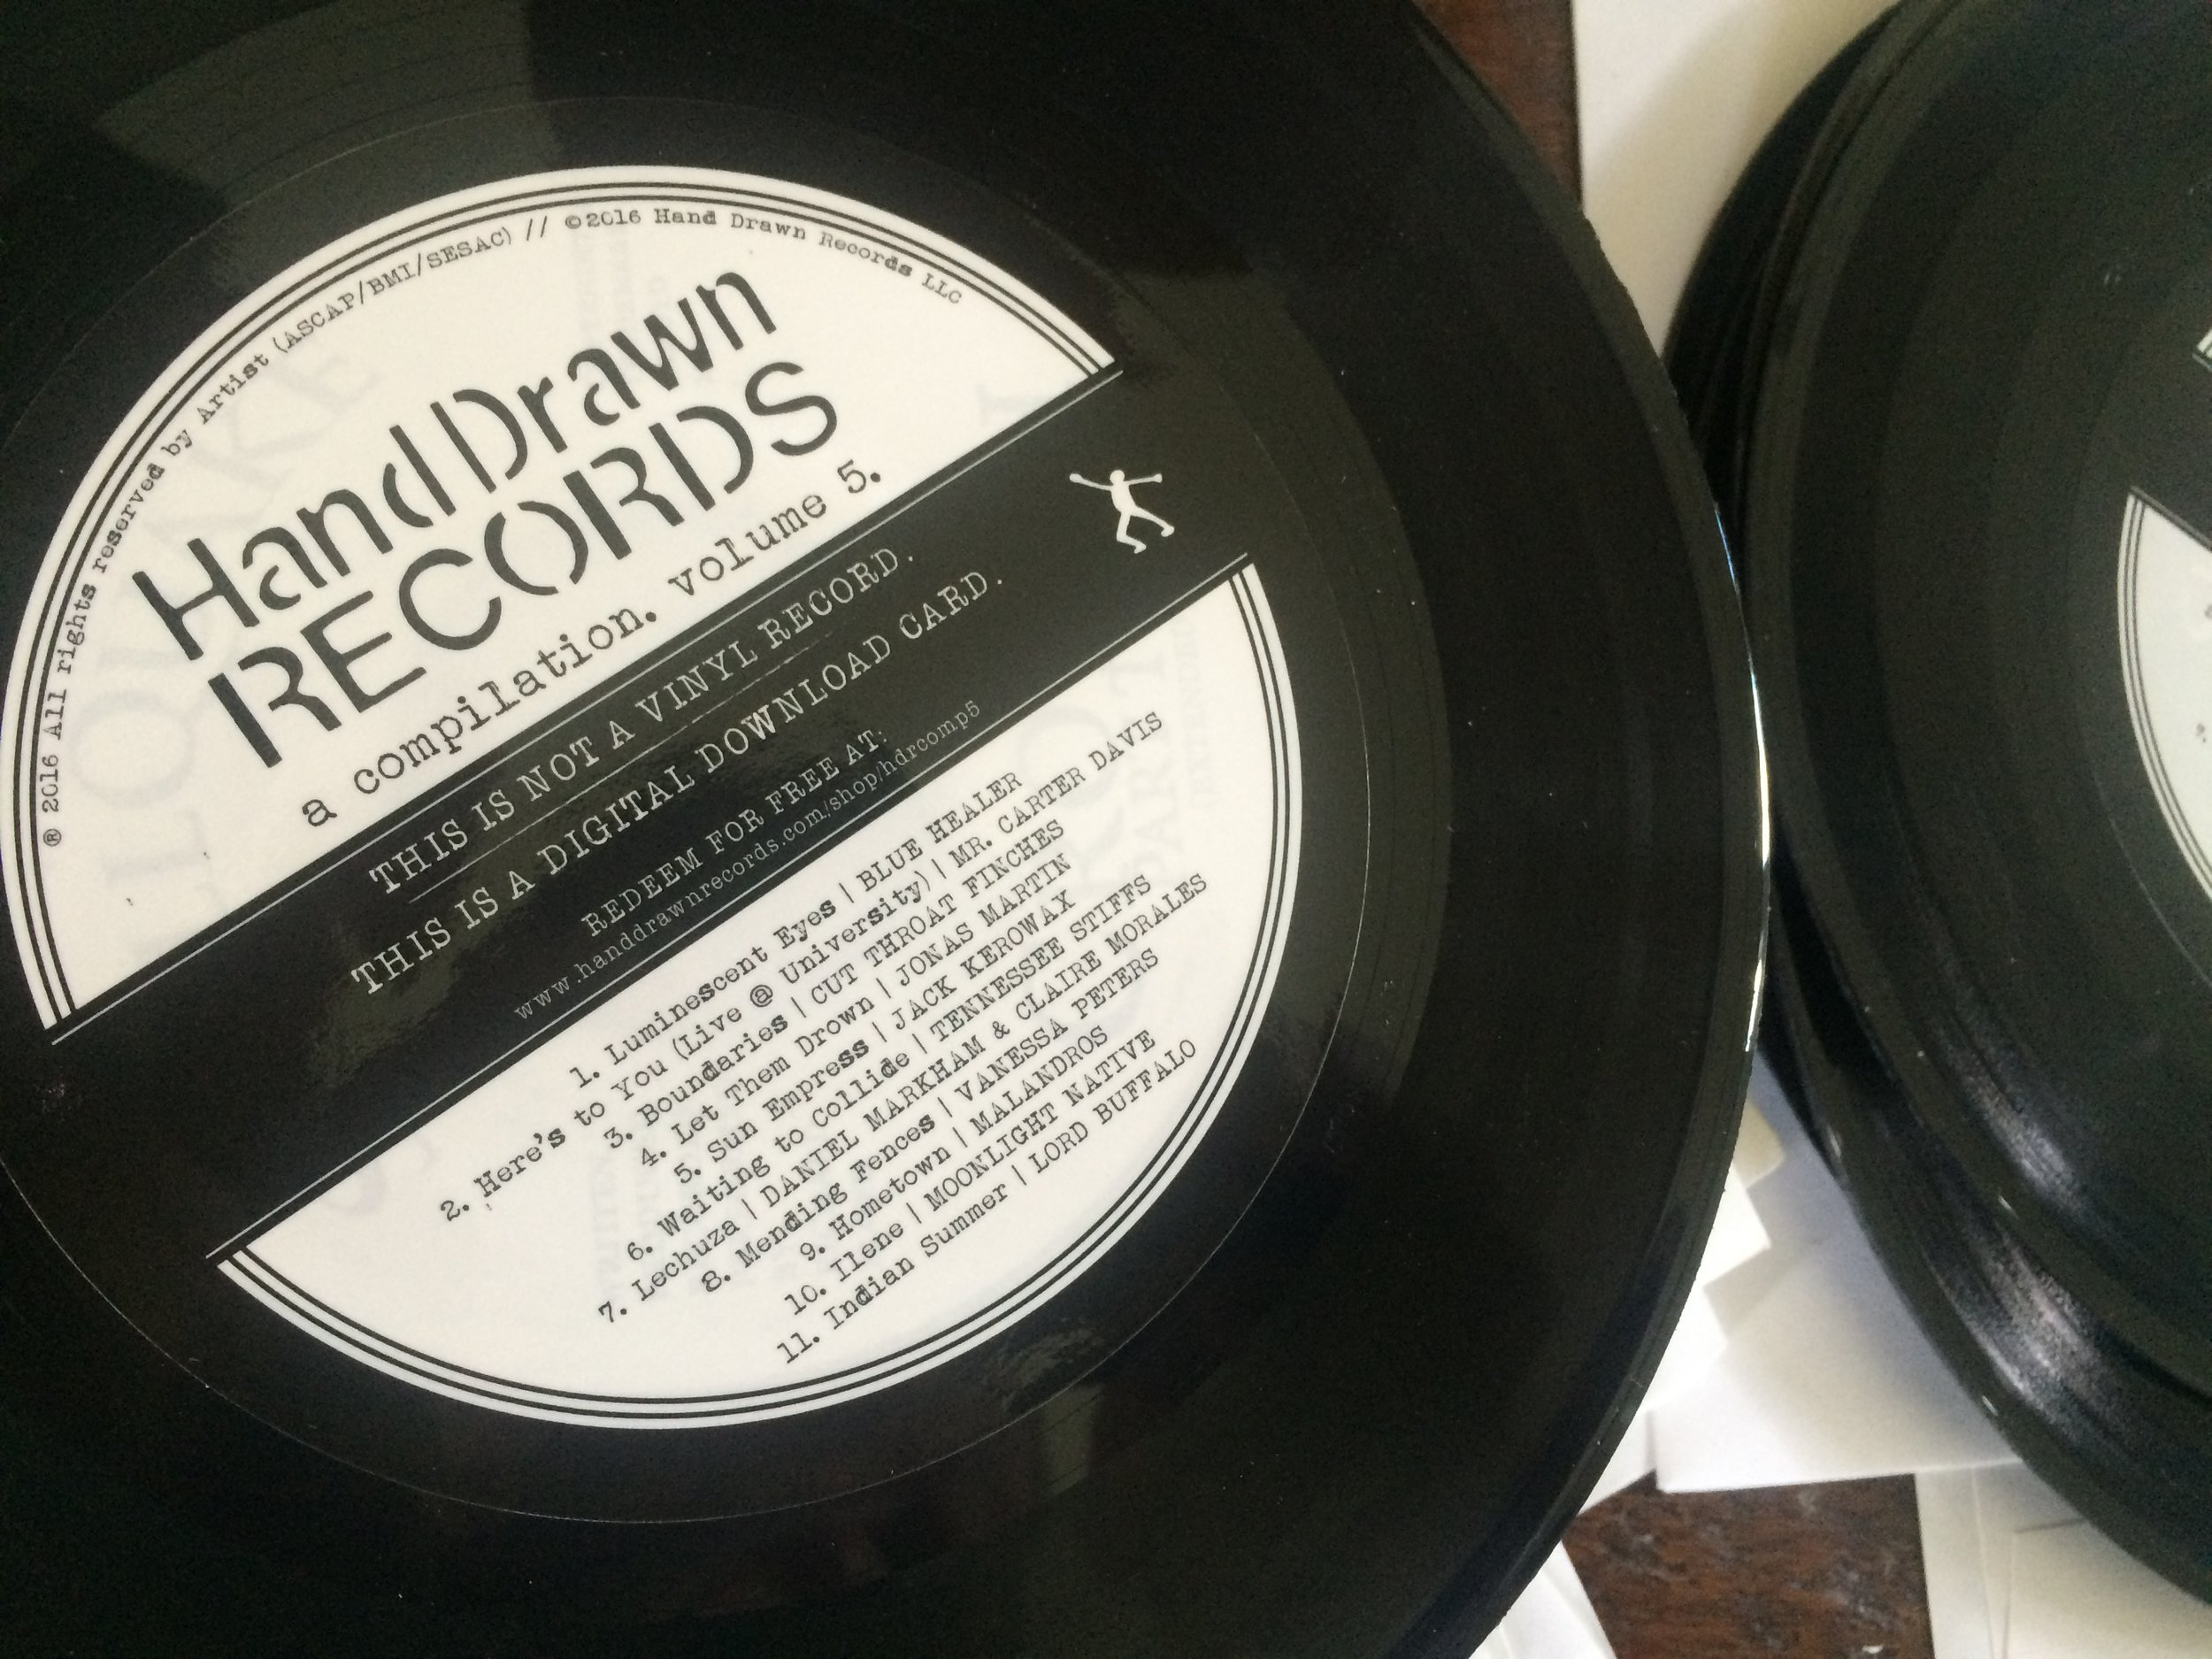 HDRComp5_vinyl05.jpg